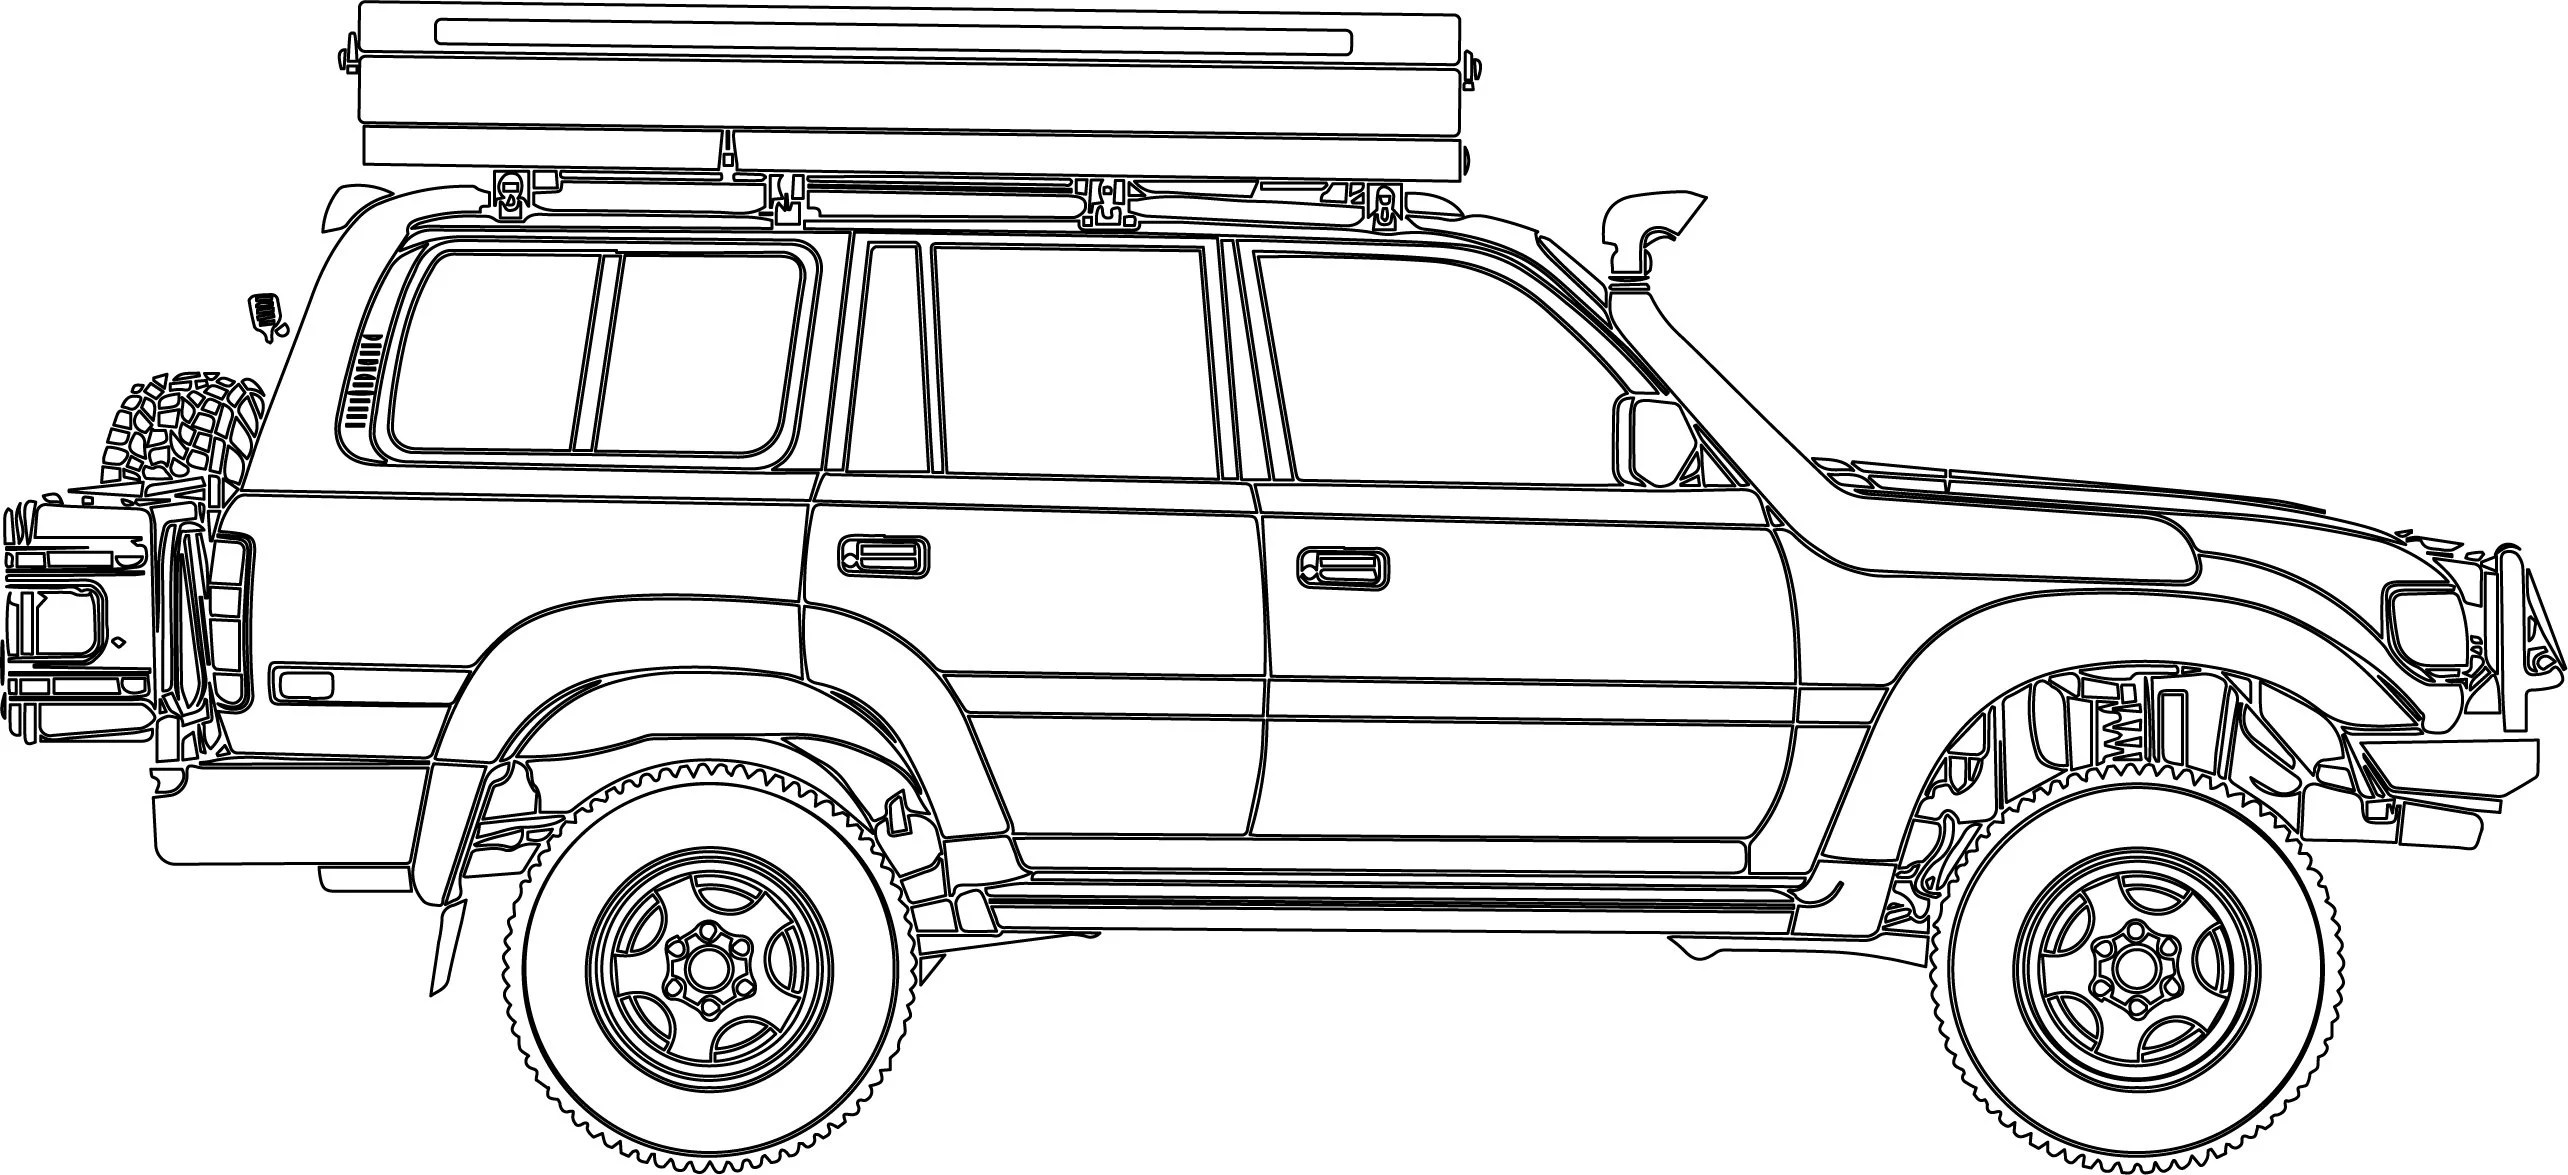 Toyota Land Cruiser 4x4 Overlanding Vehicle Dxf Ai Cnc Svg